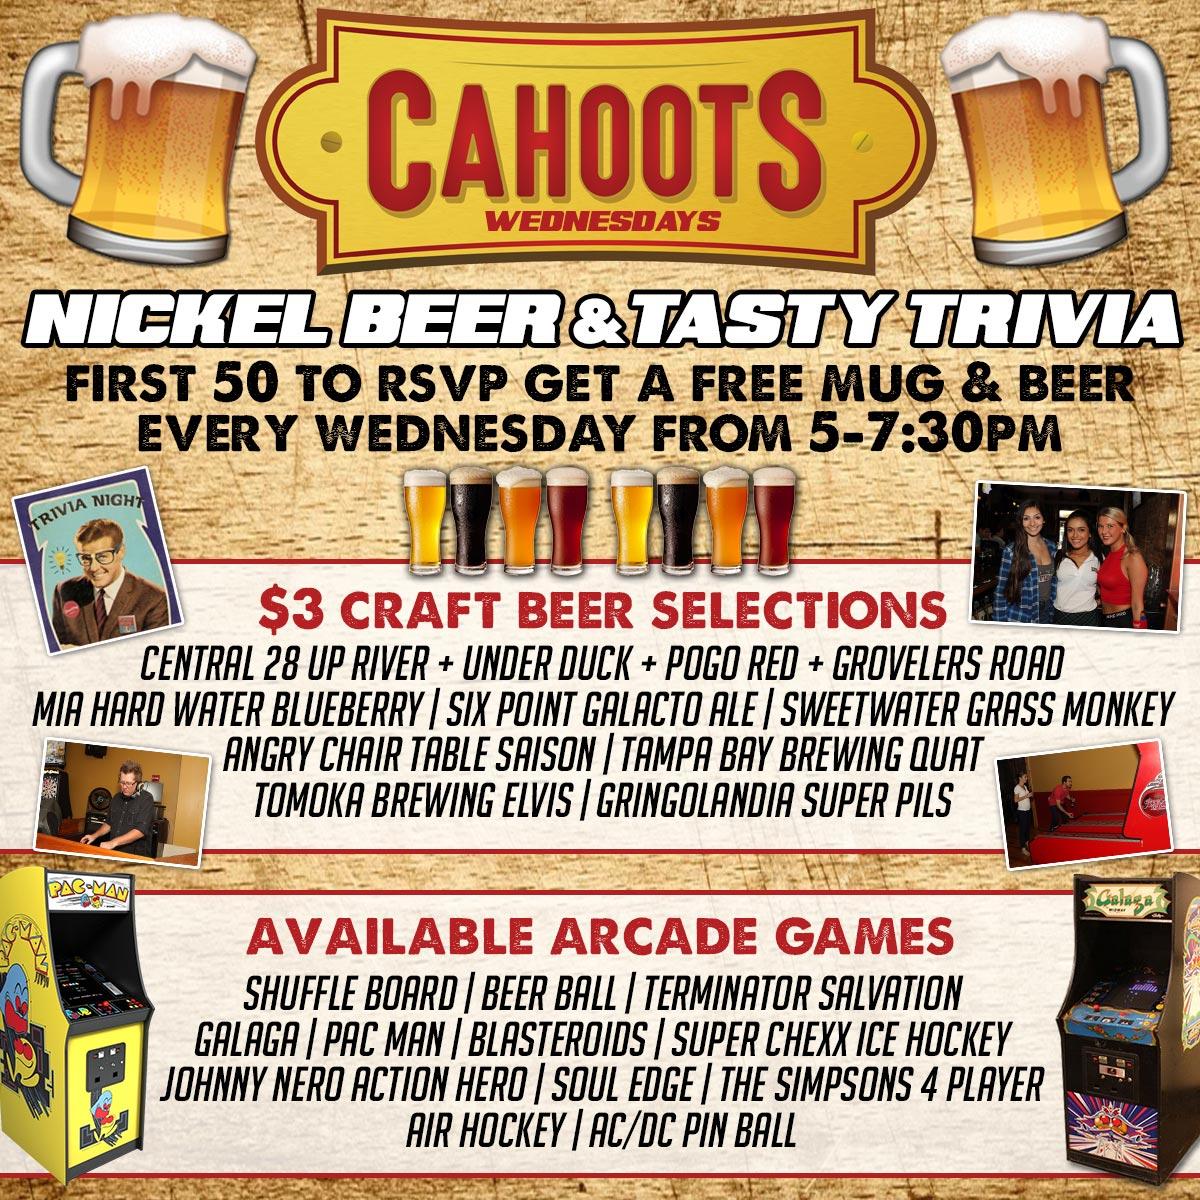 Cahoots Nickel Beer & Tasty Trivia